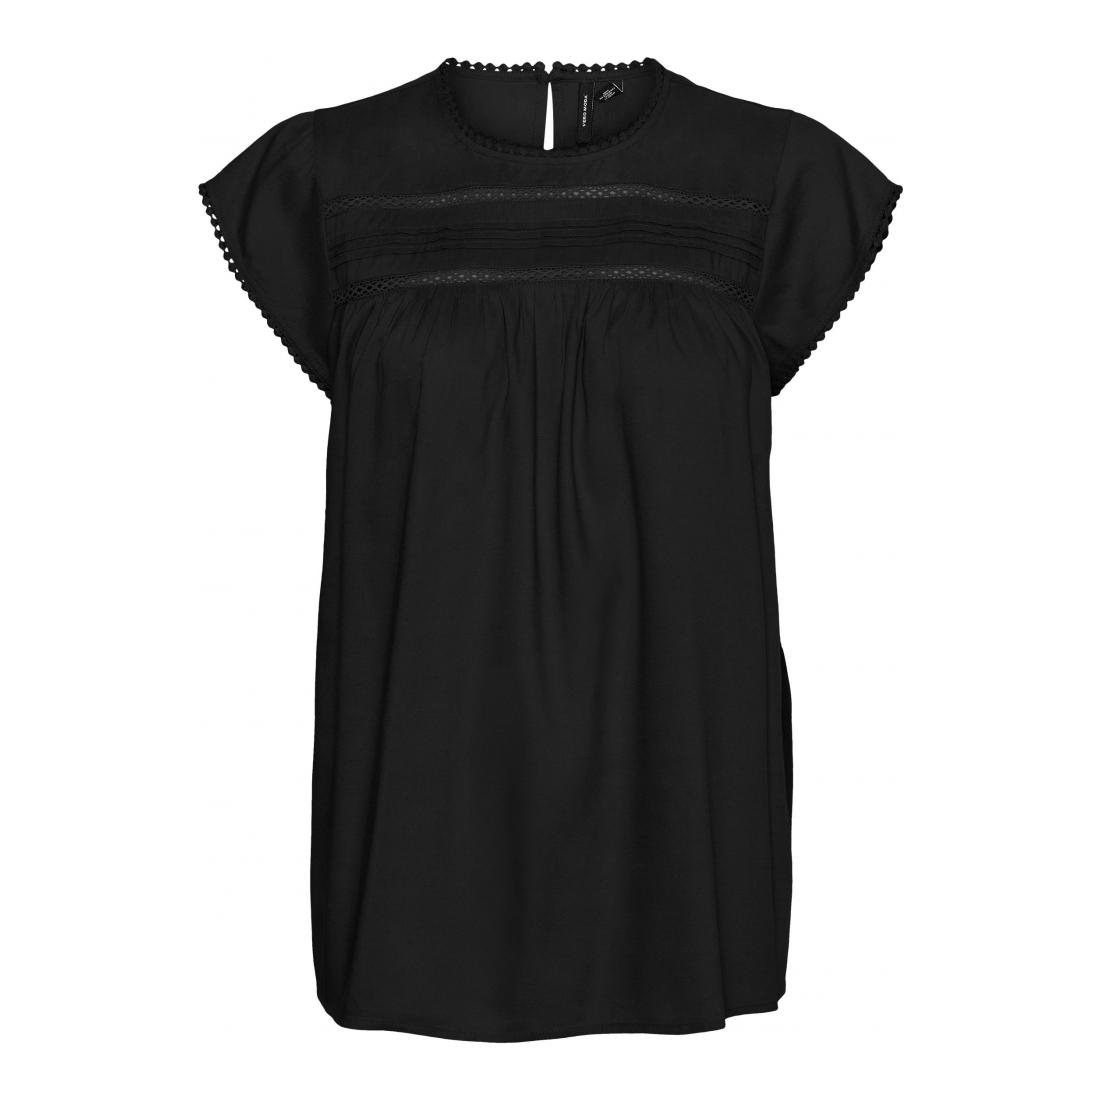 Vero Moda T-Shirt Damen VMDEBBIE PLEAT S/L TOP GA